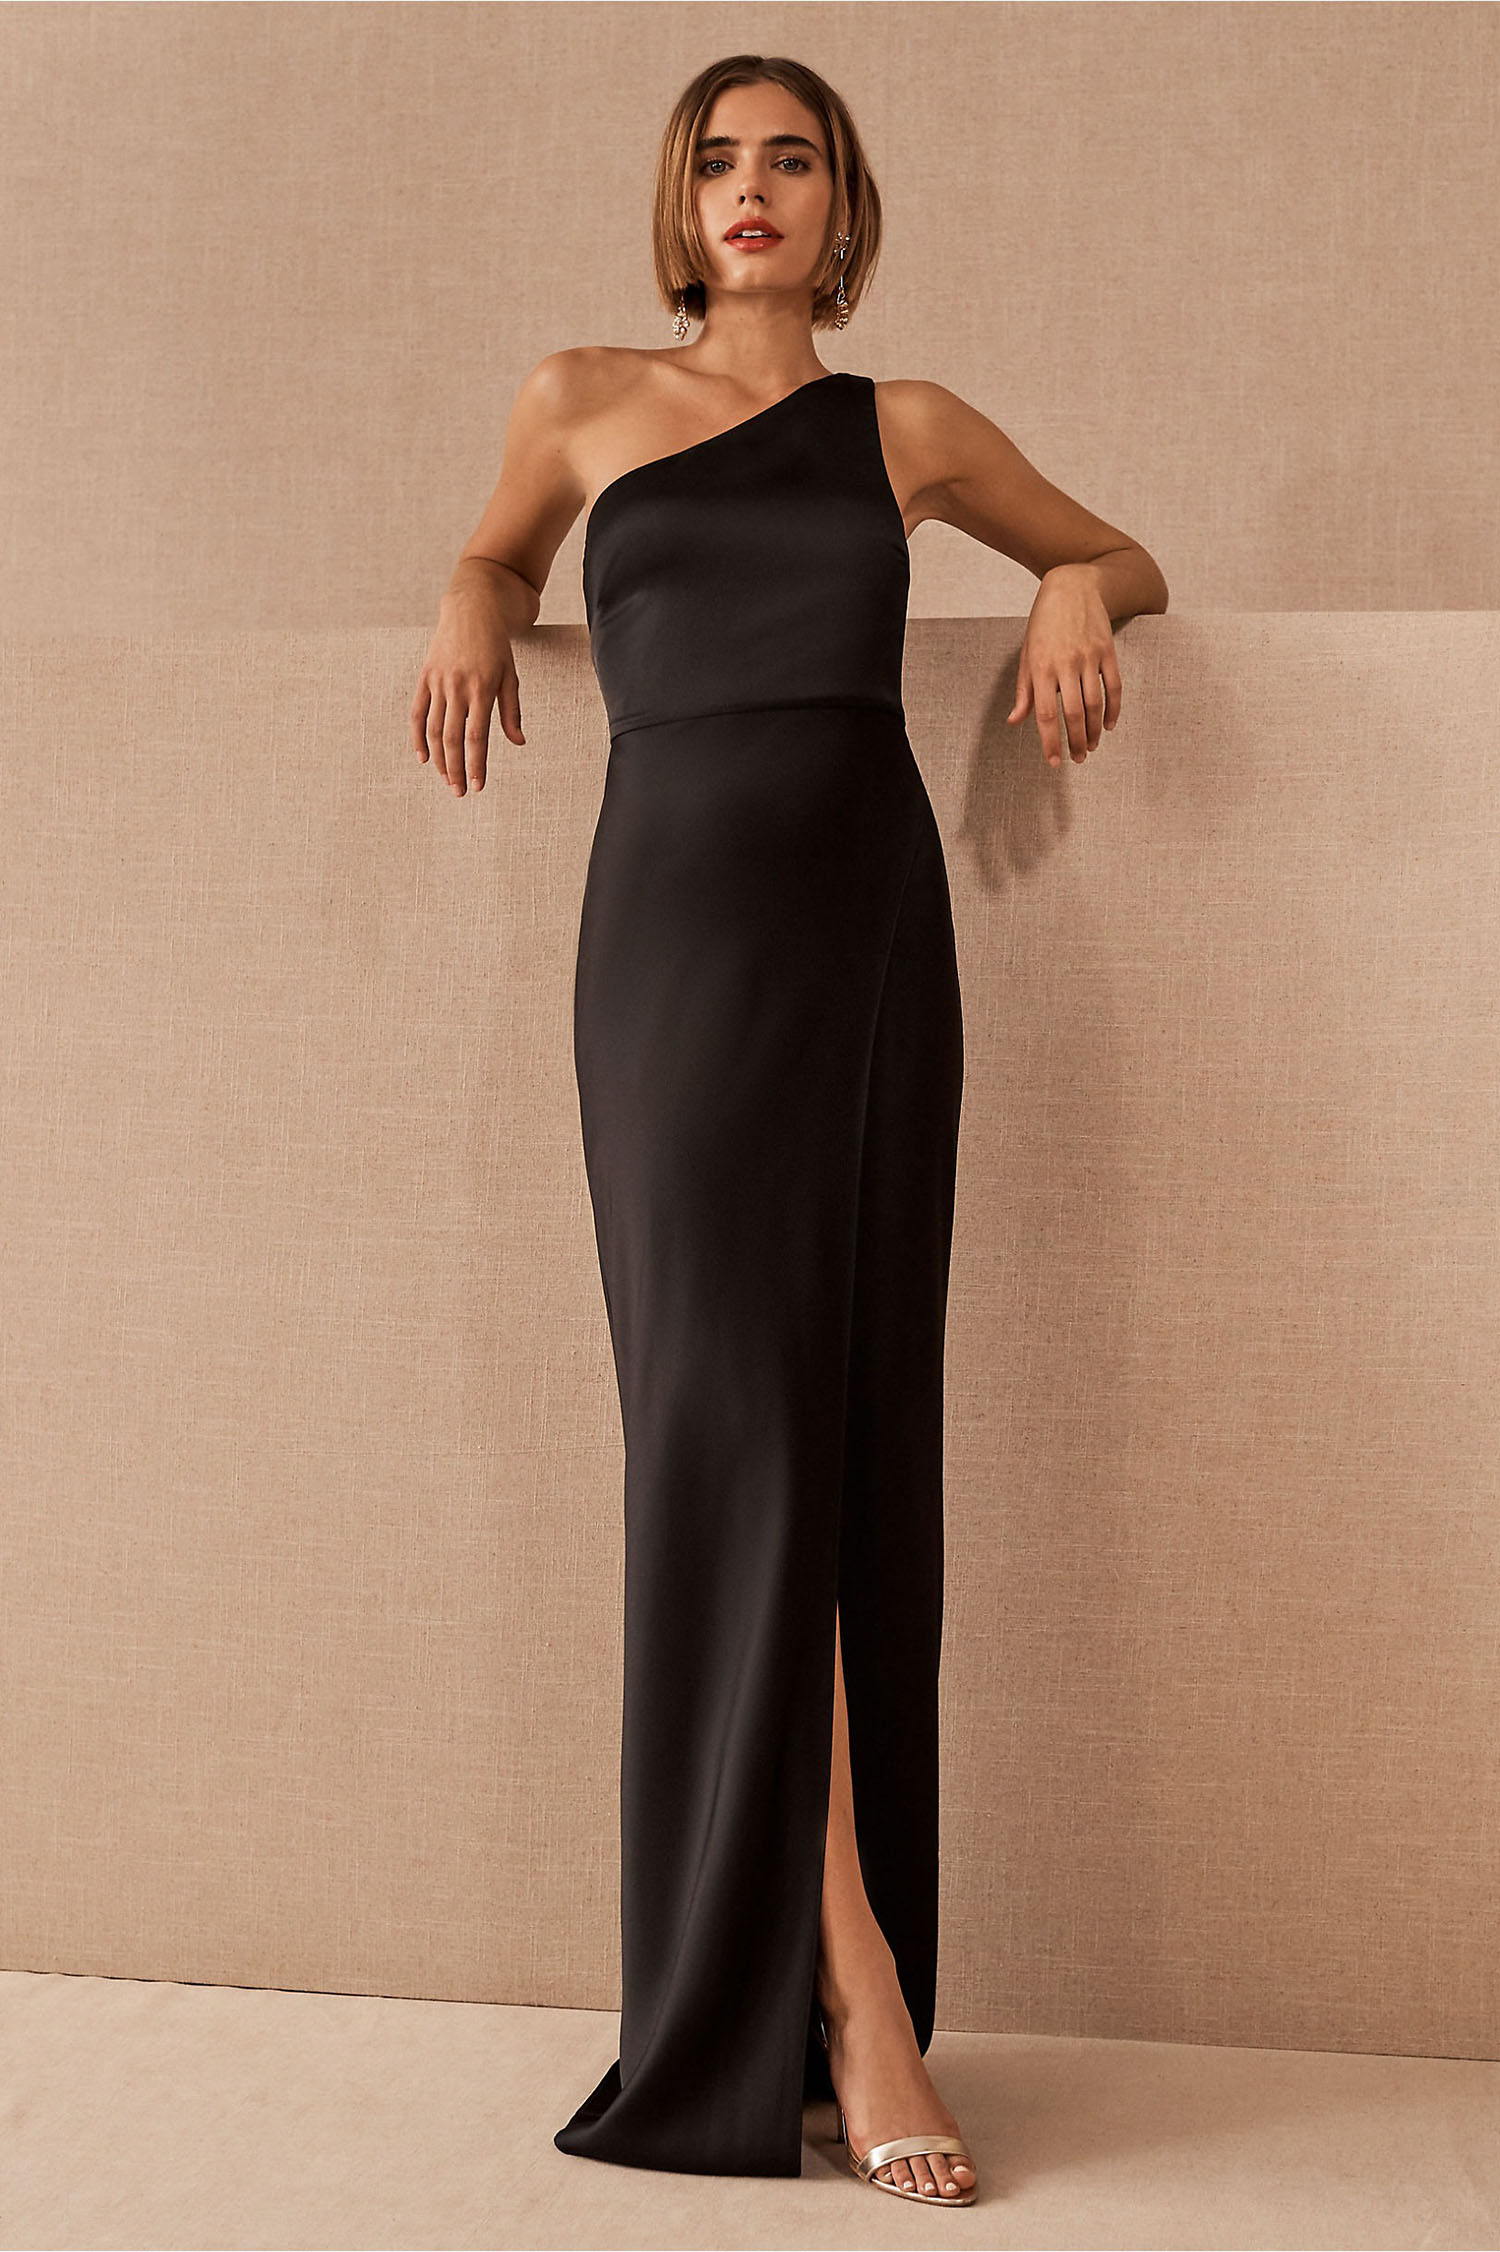 satin one shoulder sleek black gown from BHLDN